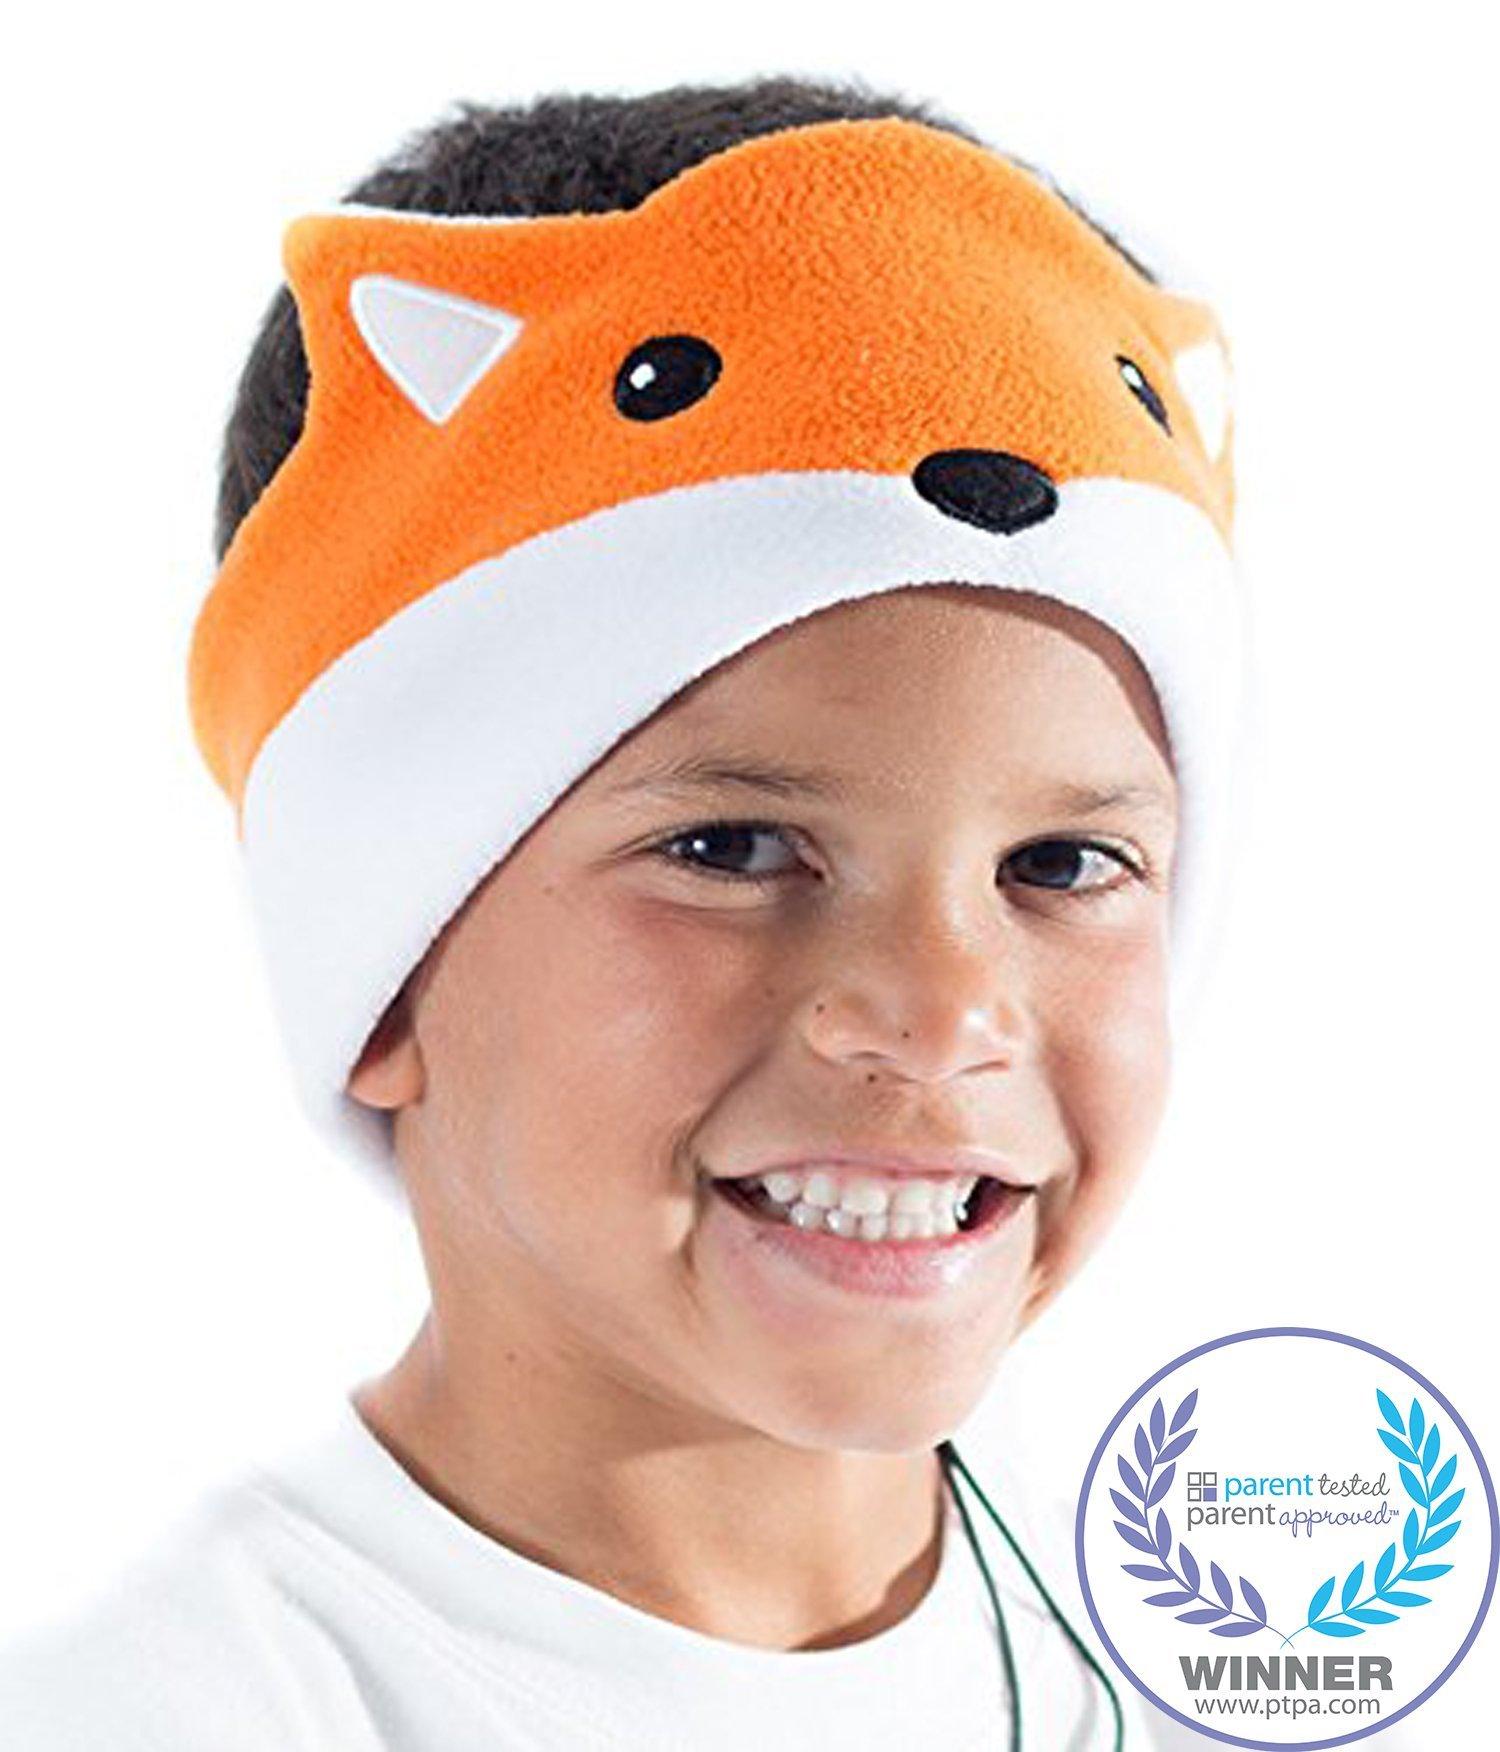 CozyPhones Kids Headphones Volume Limited with Ultra-Thin Speakers Soft Fleece Headband - Perfect Children's Earphones for Home and Travel - Fox